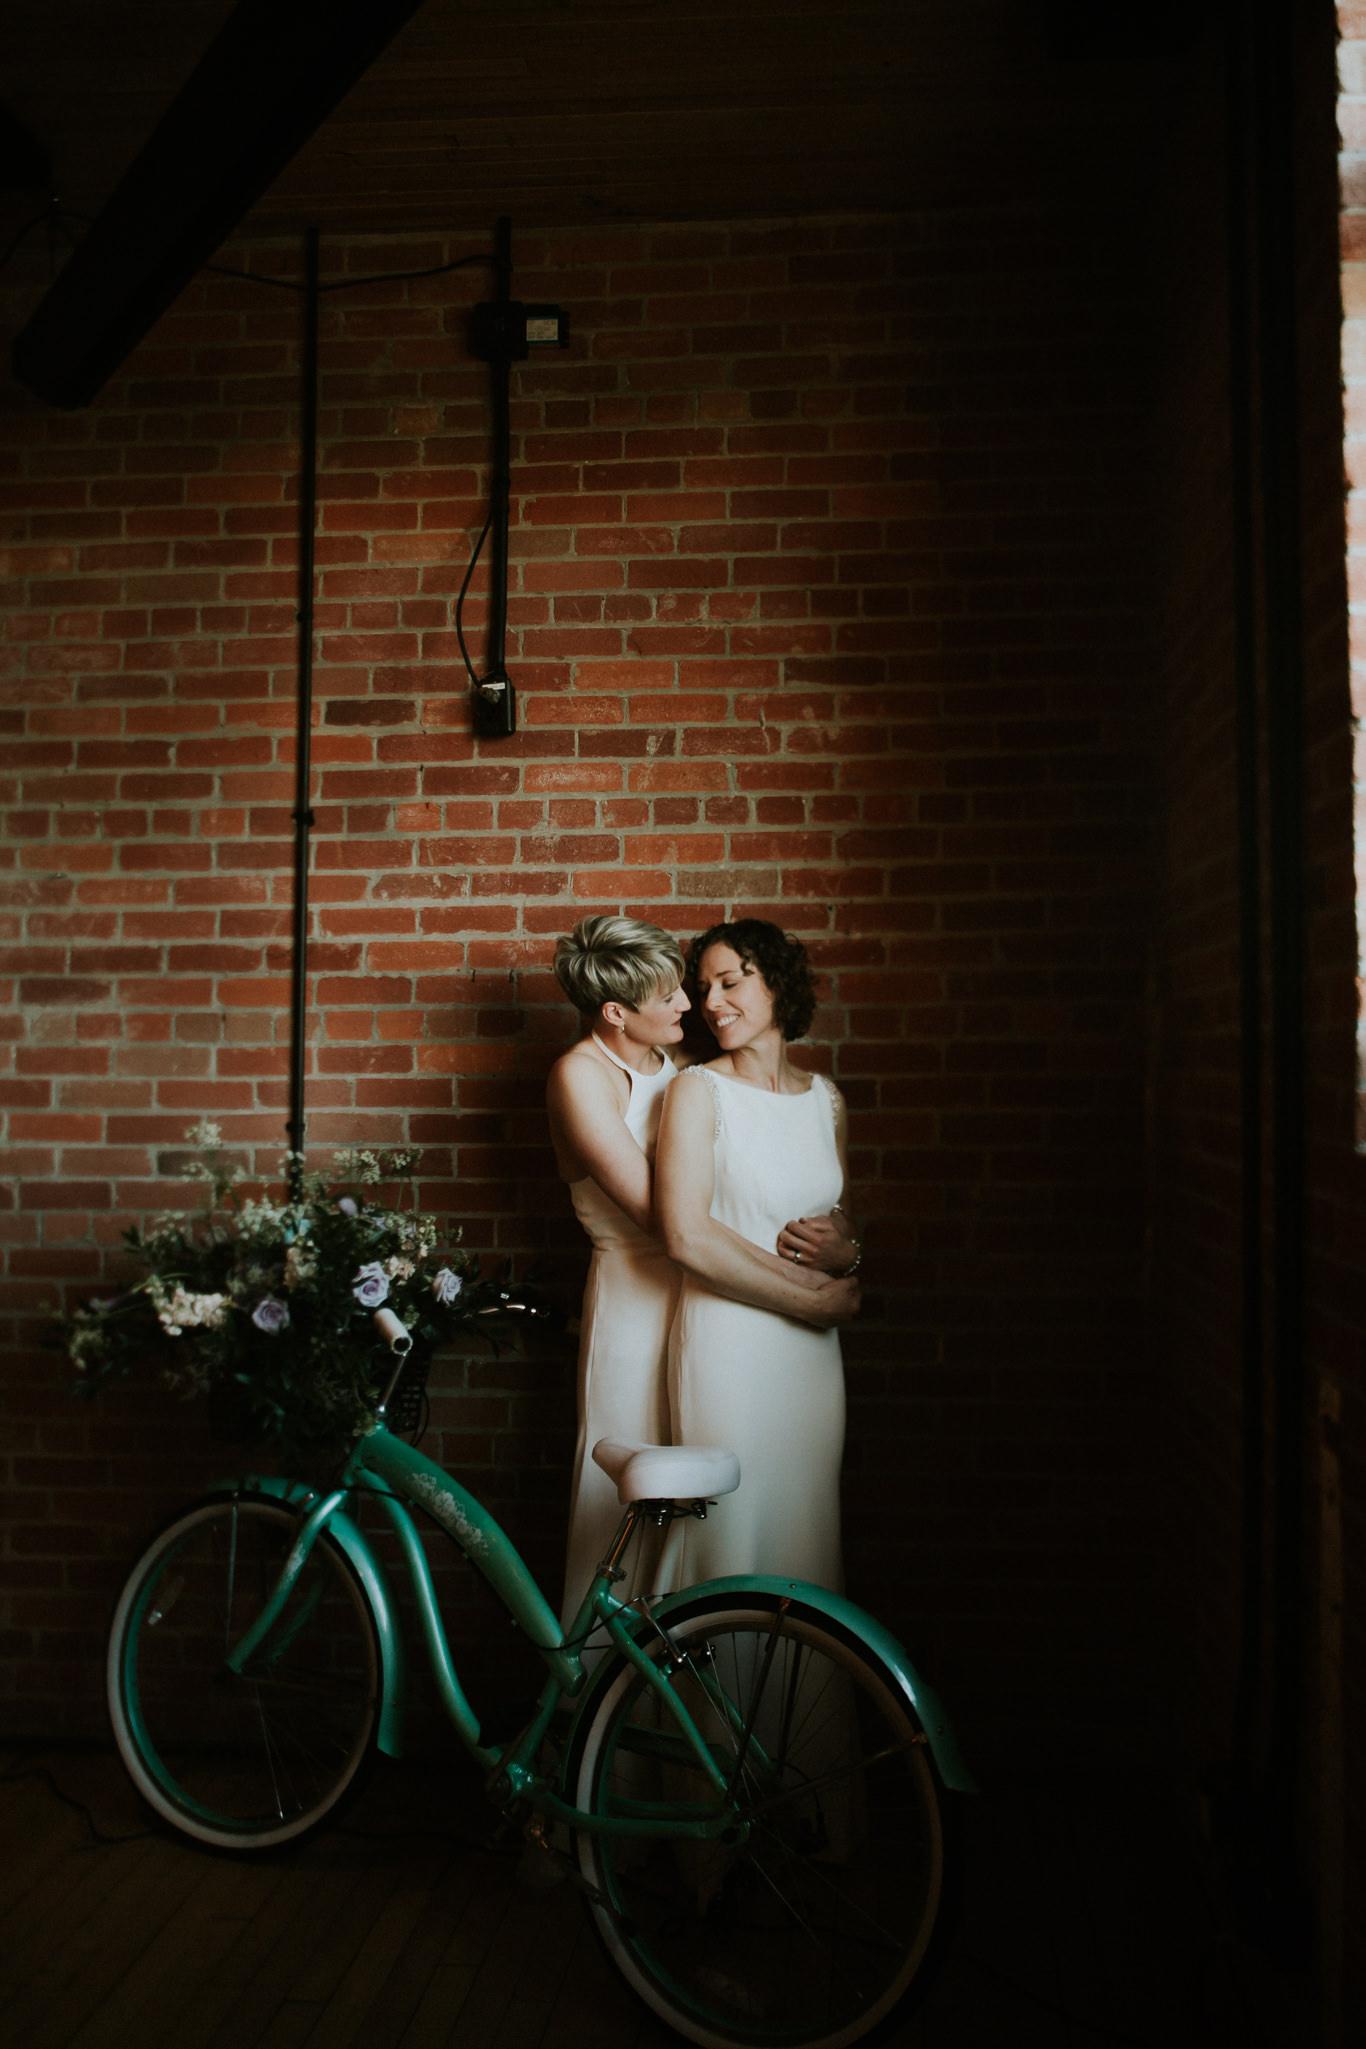 Lindsay-and-Heather-Charbar-Restaurant-Wedding-in-Calgary-153